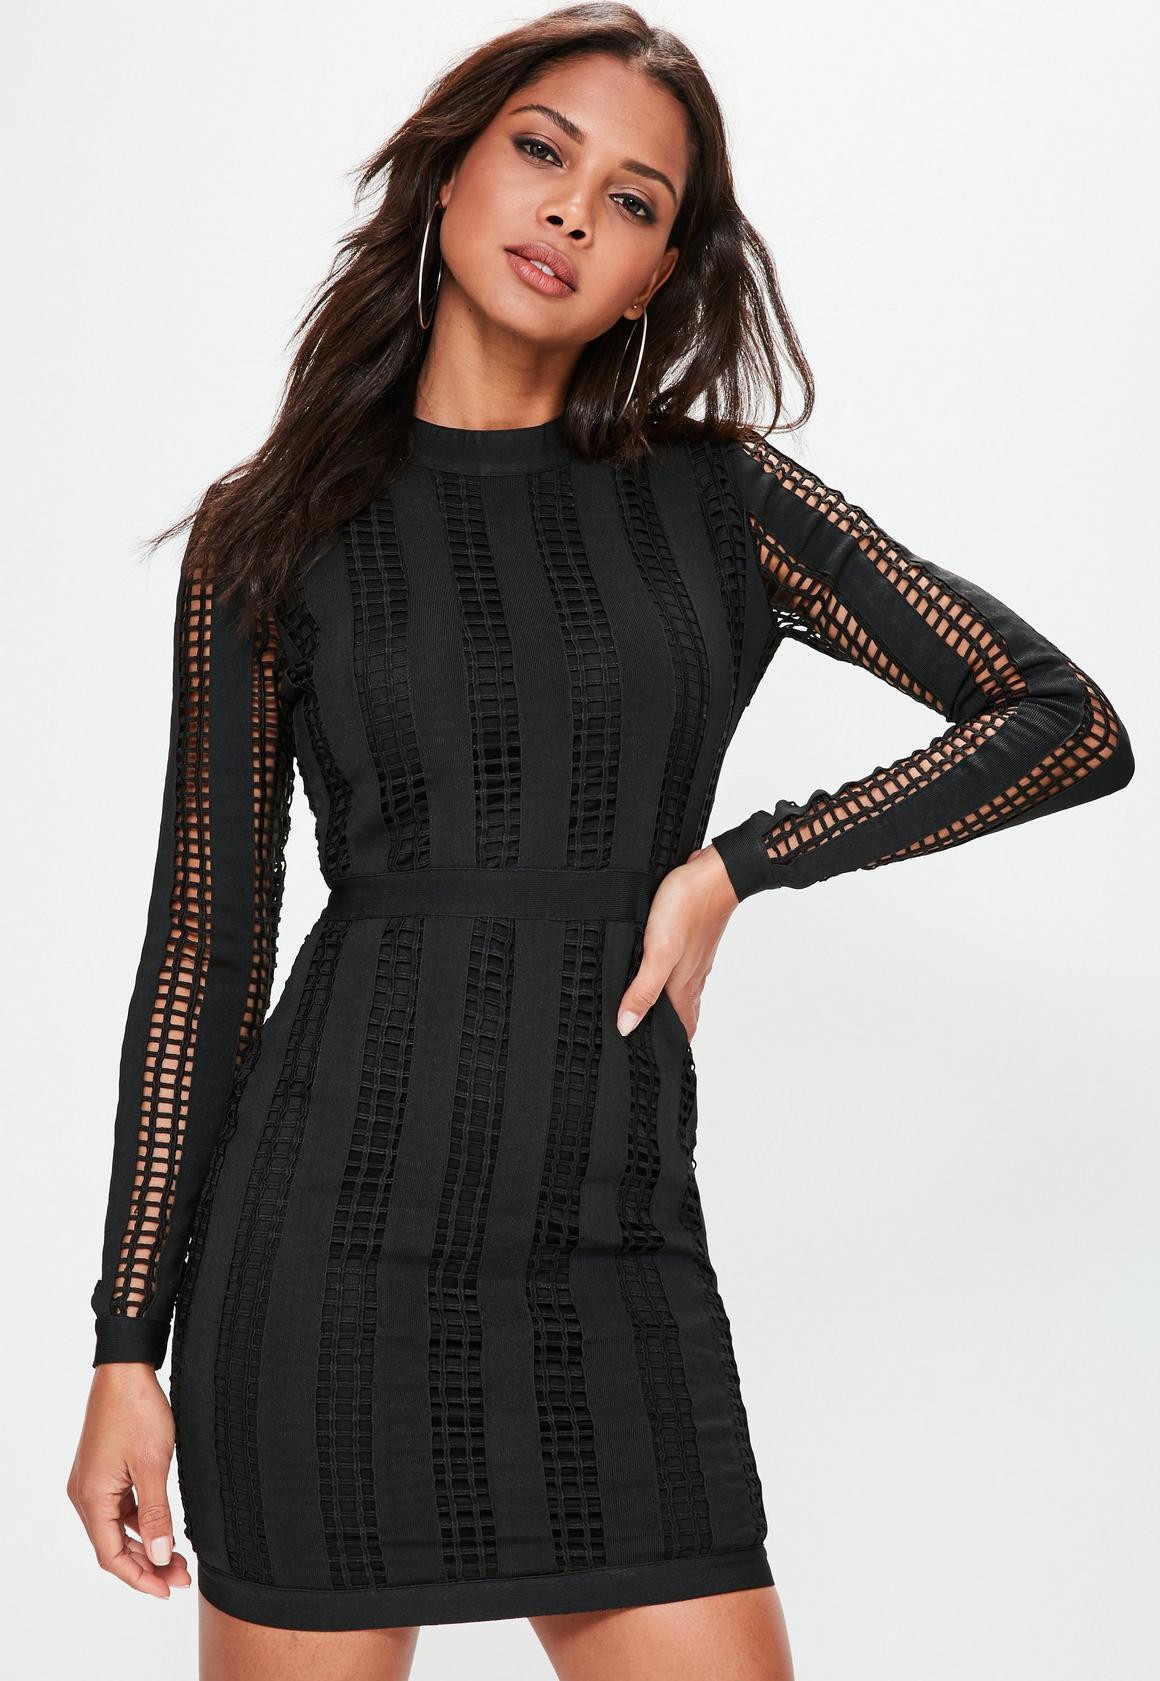 Black High Neck Long Sleeve Bandage Dress | Missguided